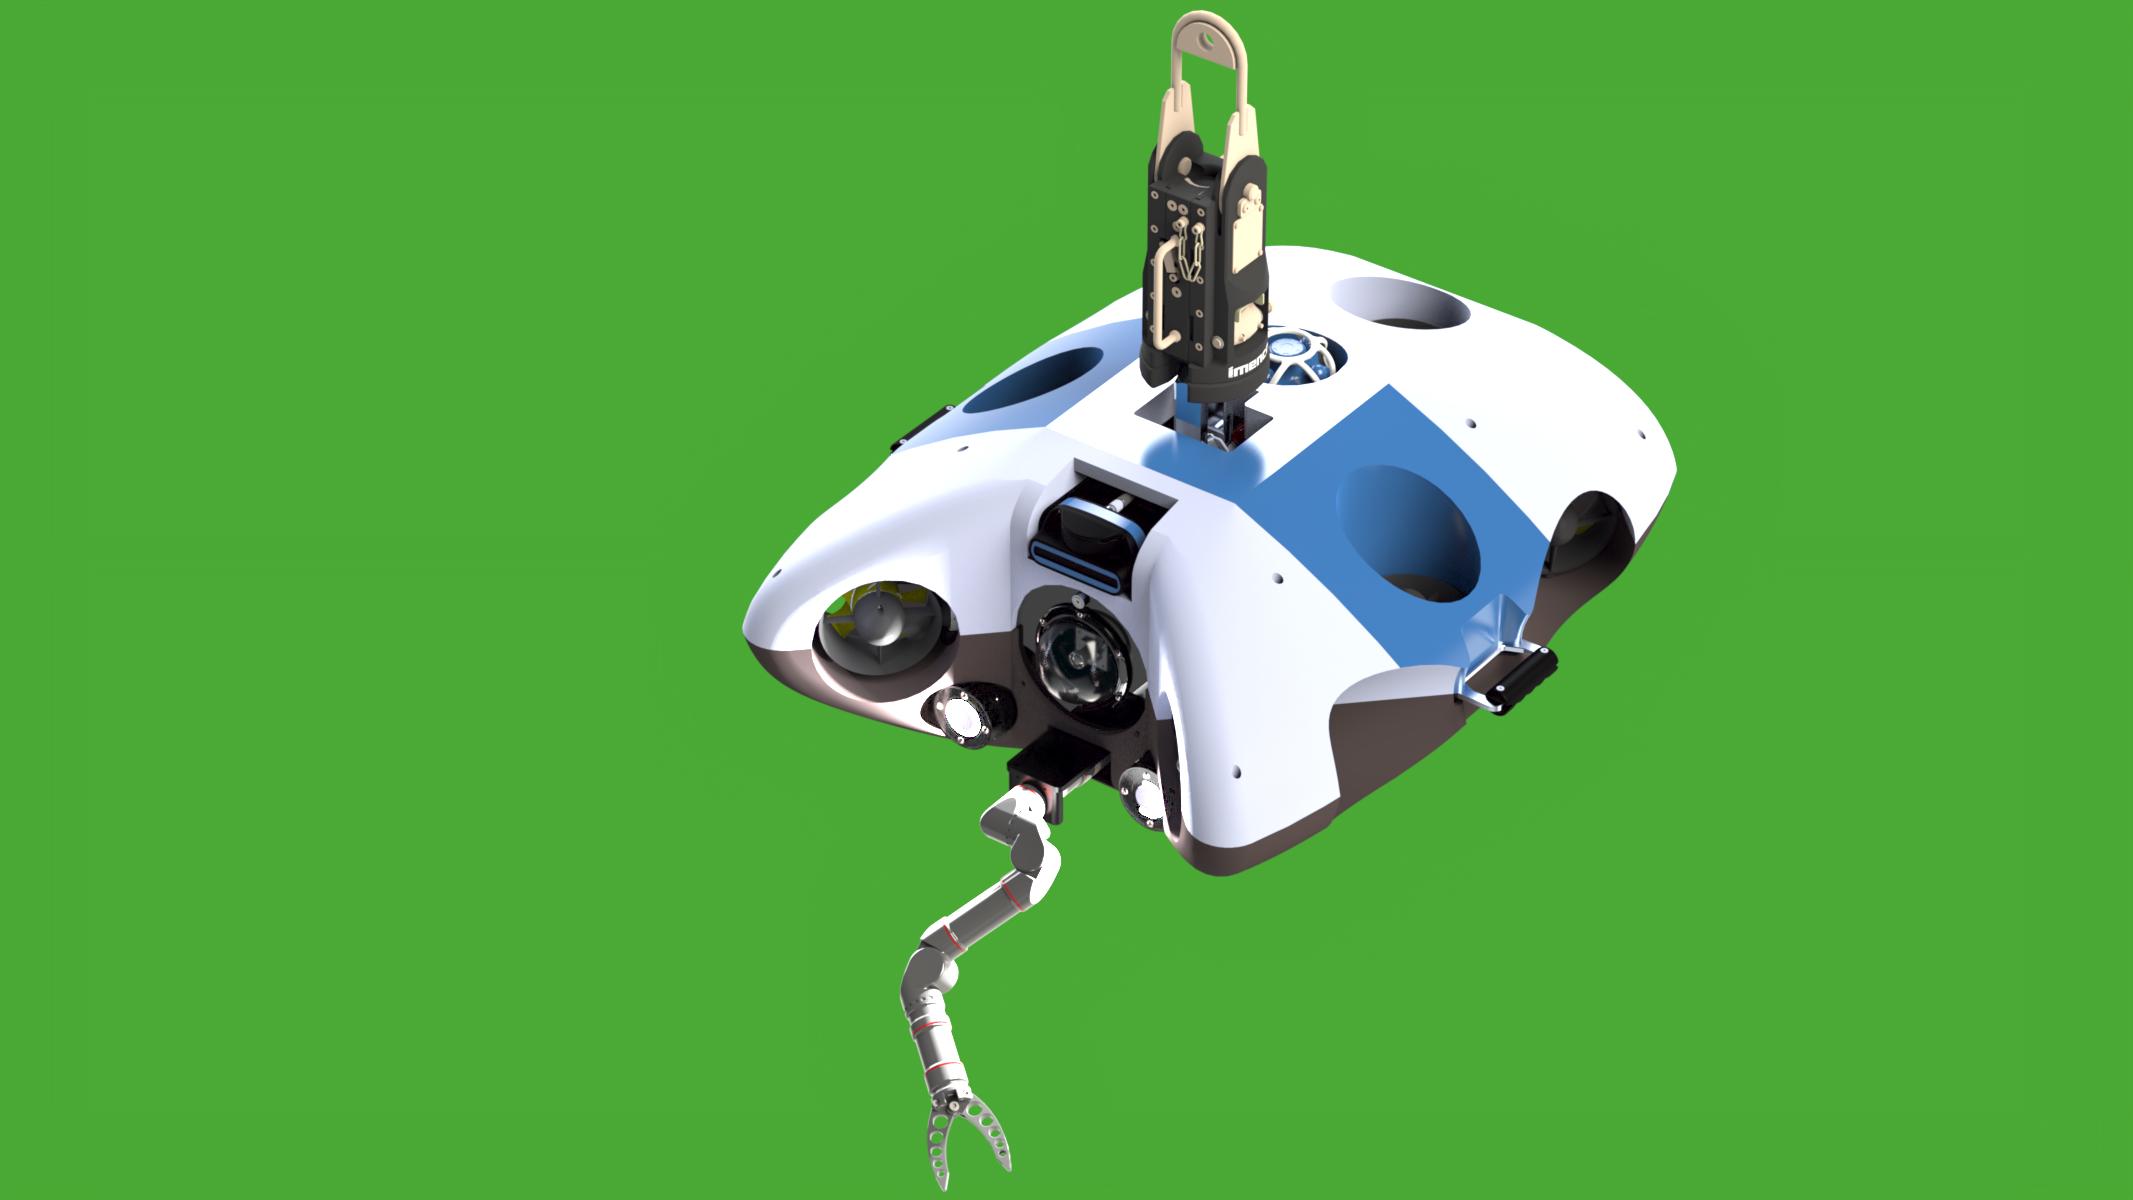 AUV with Reach Alpha manipulator and imenco